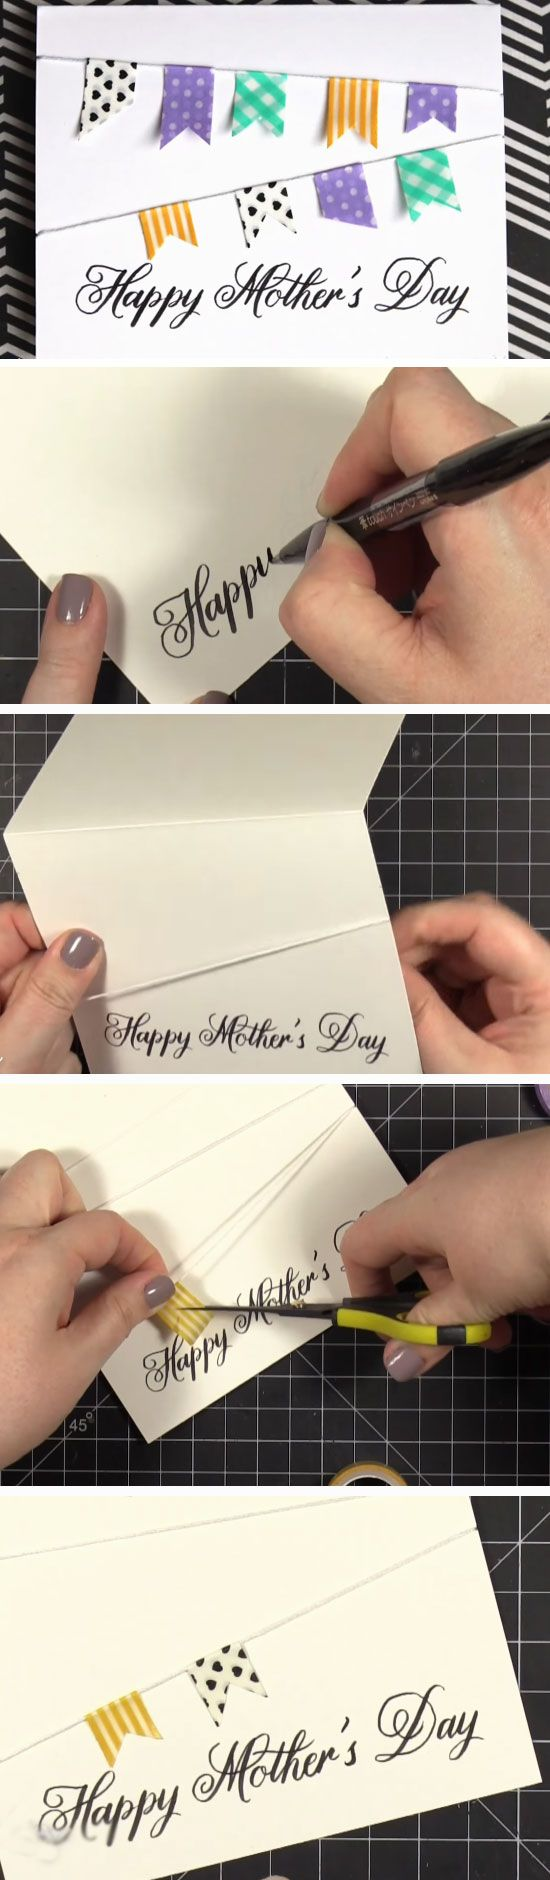 36 Best Mother S Day Design Crafts Images On Pinterest Mother S